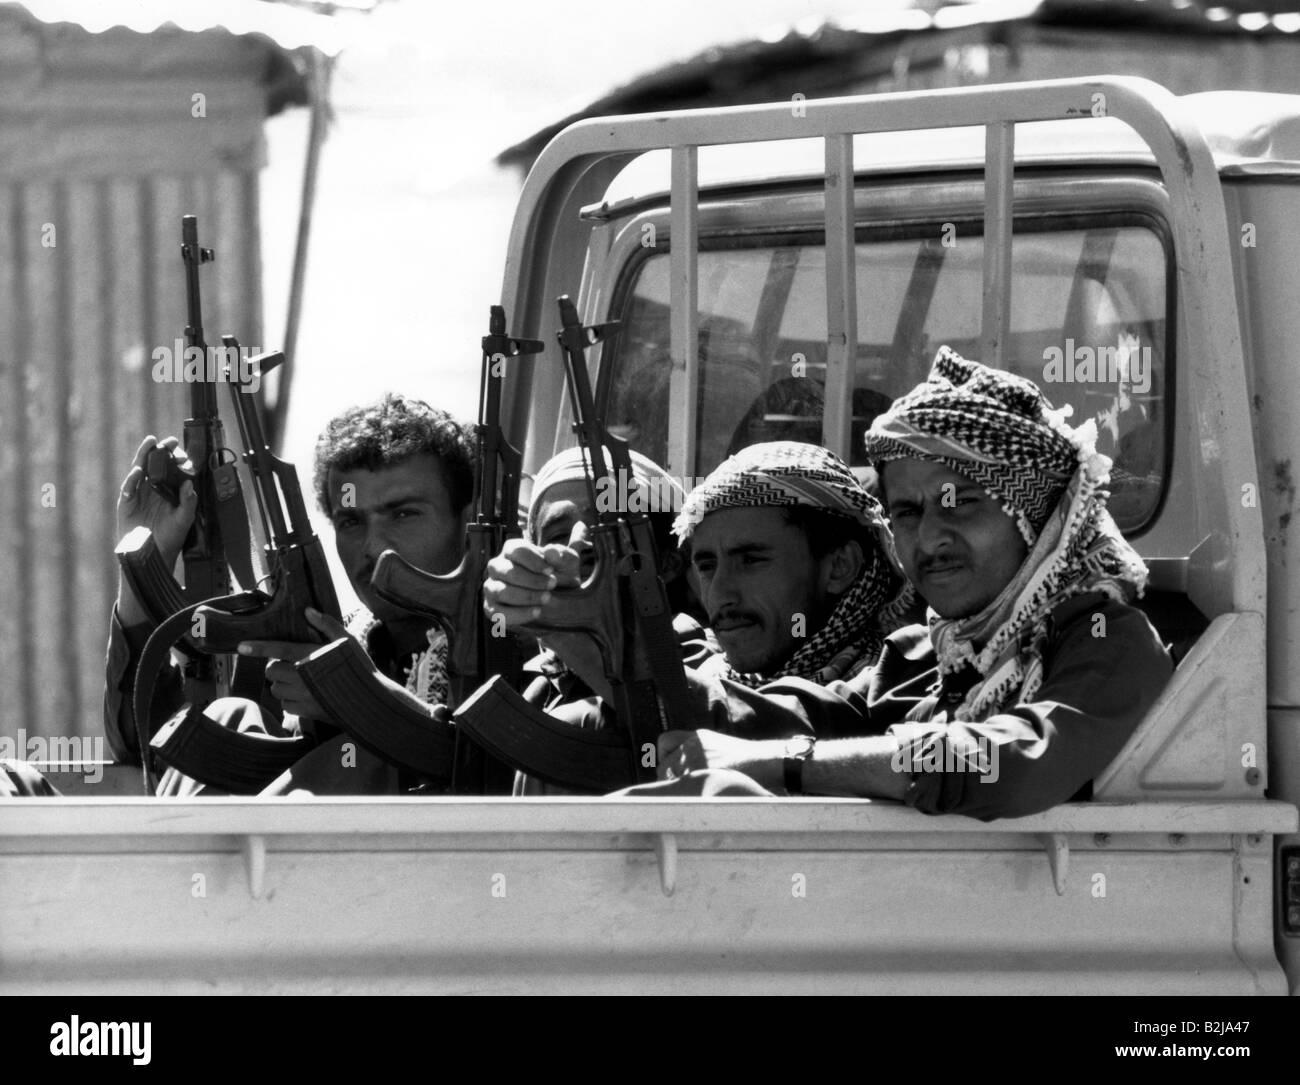 military, Yemen, sldiers on a truck, 1998, weapons, assault rifle, AK47, AK 47, AK-47, Kalashnikov, Arabs, Arabia, - Stock Image